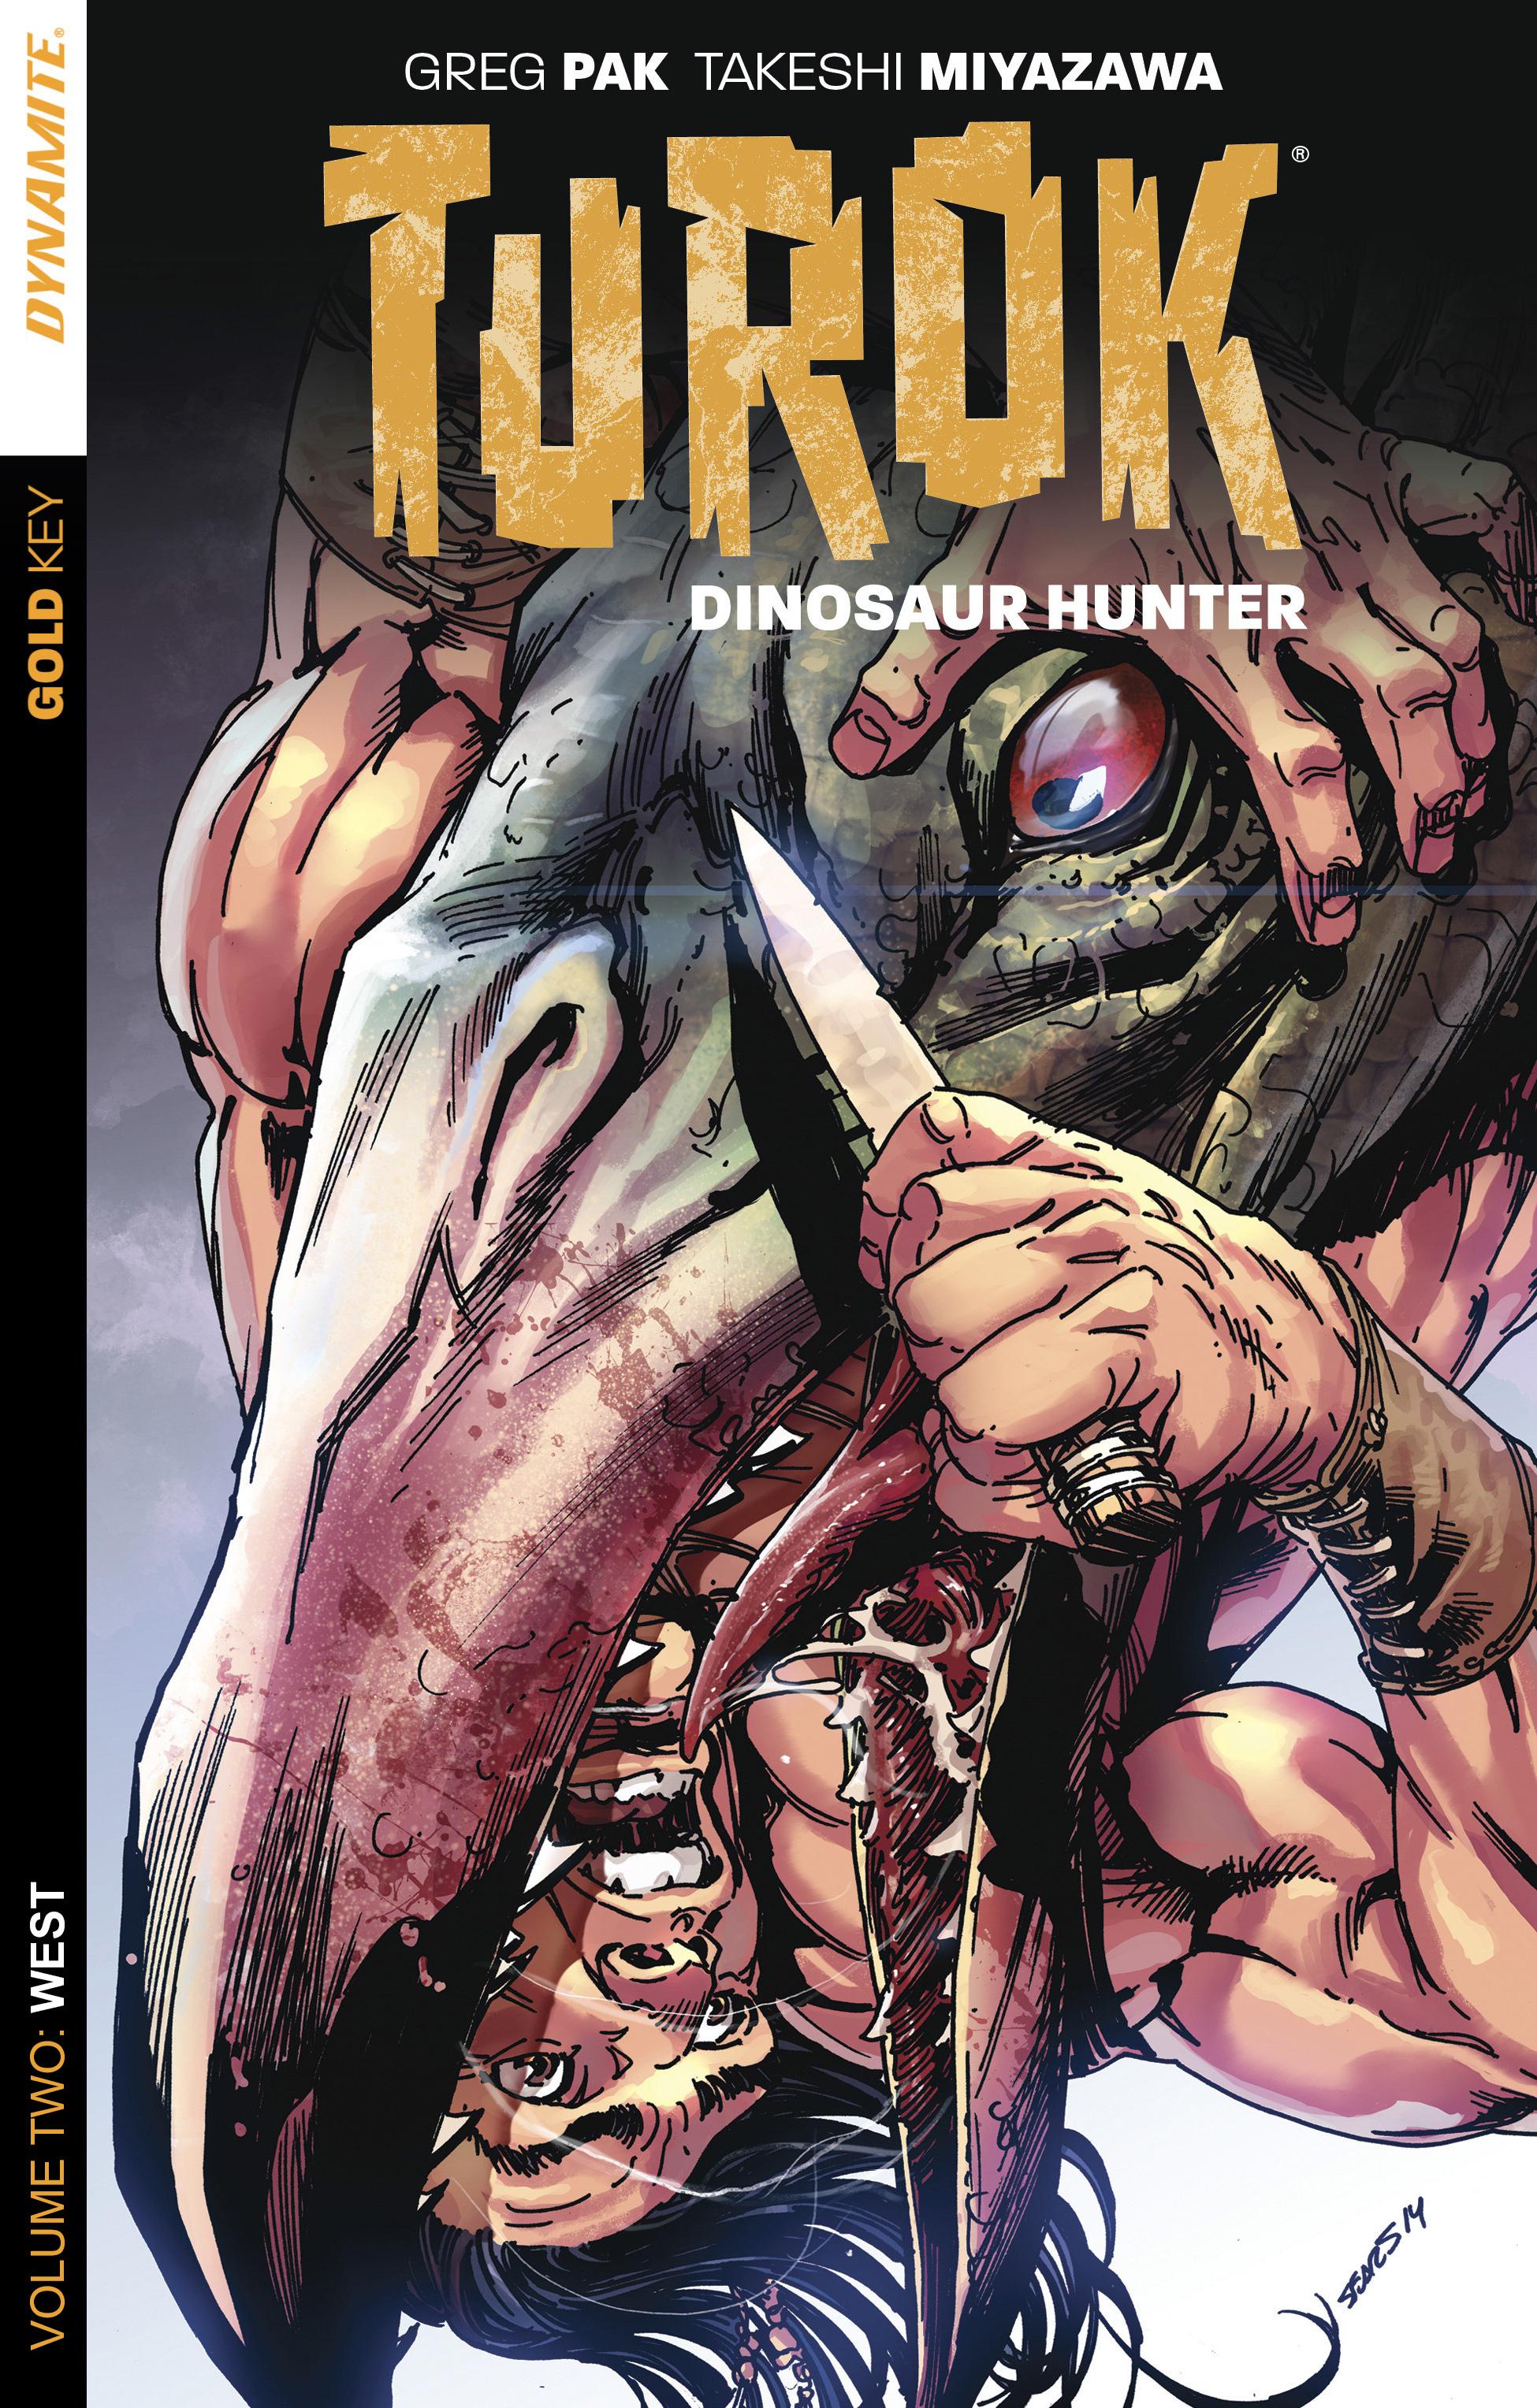 Read online Turok: Dinosaur Hunter (2014) comic -  Issue # _TPB 2 - 1